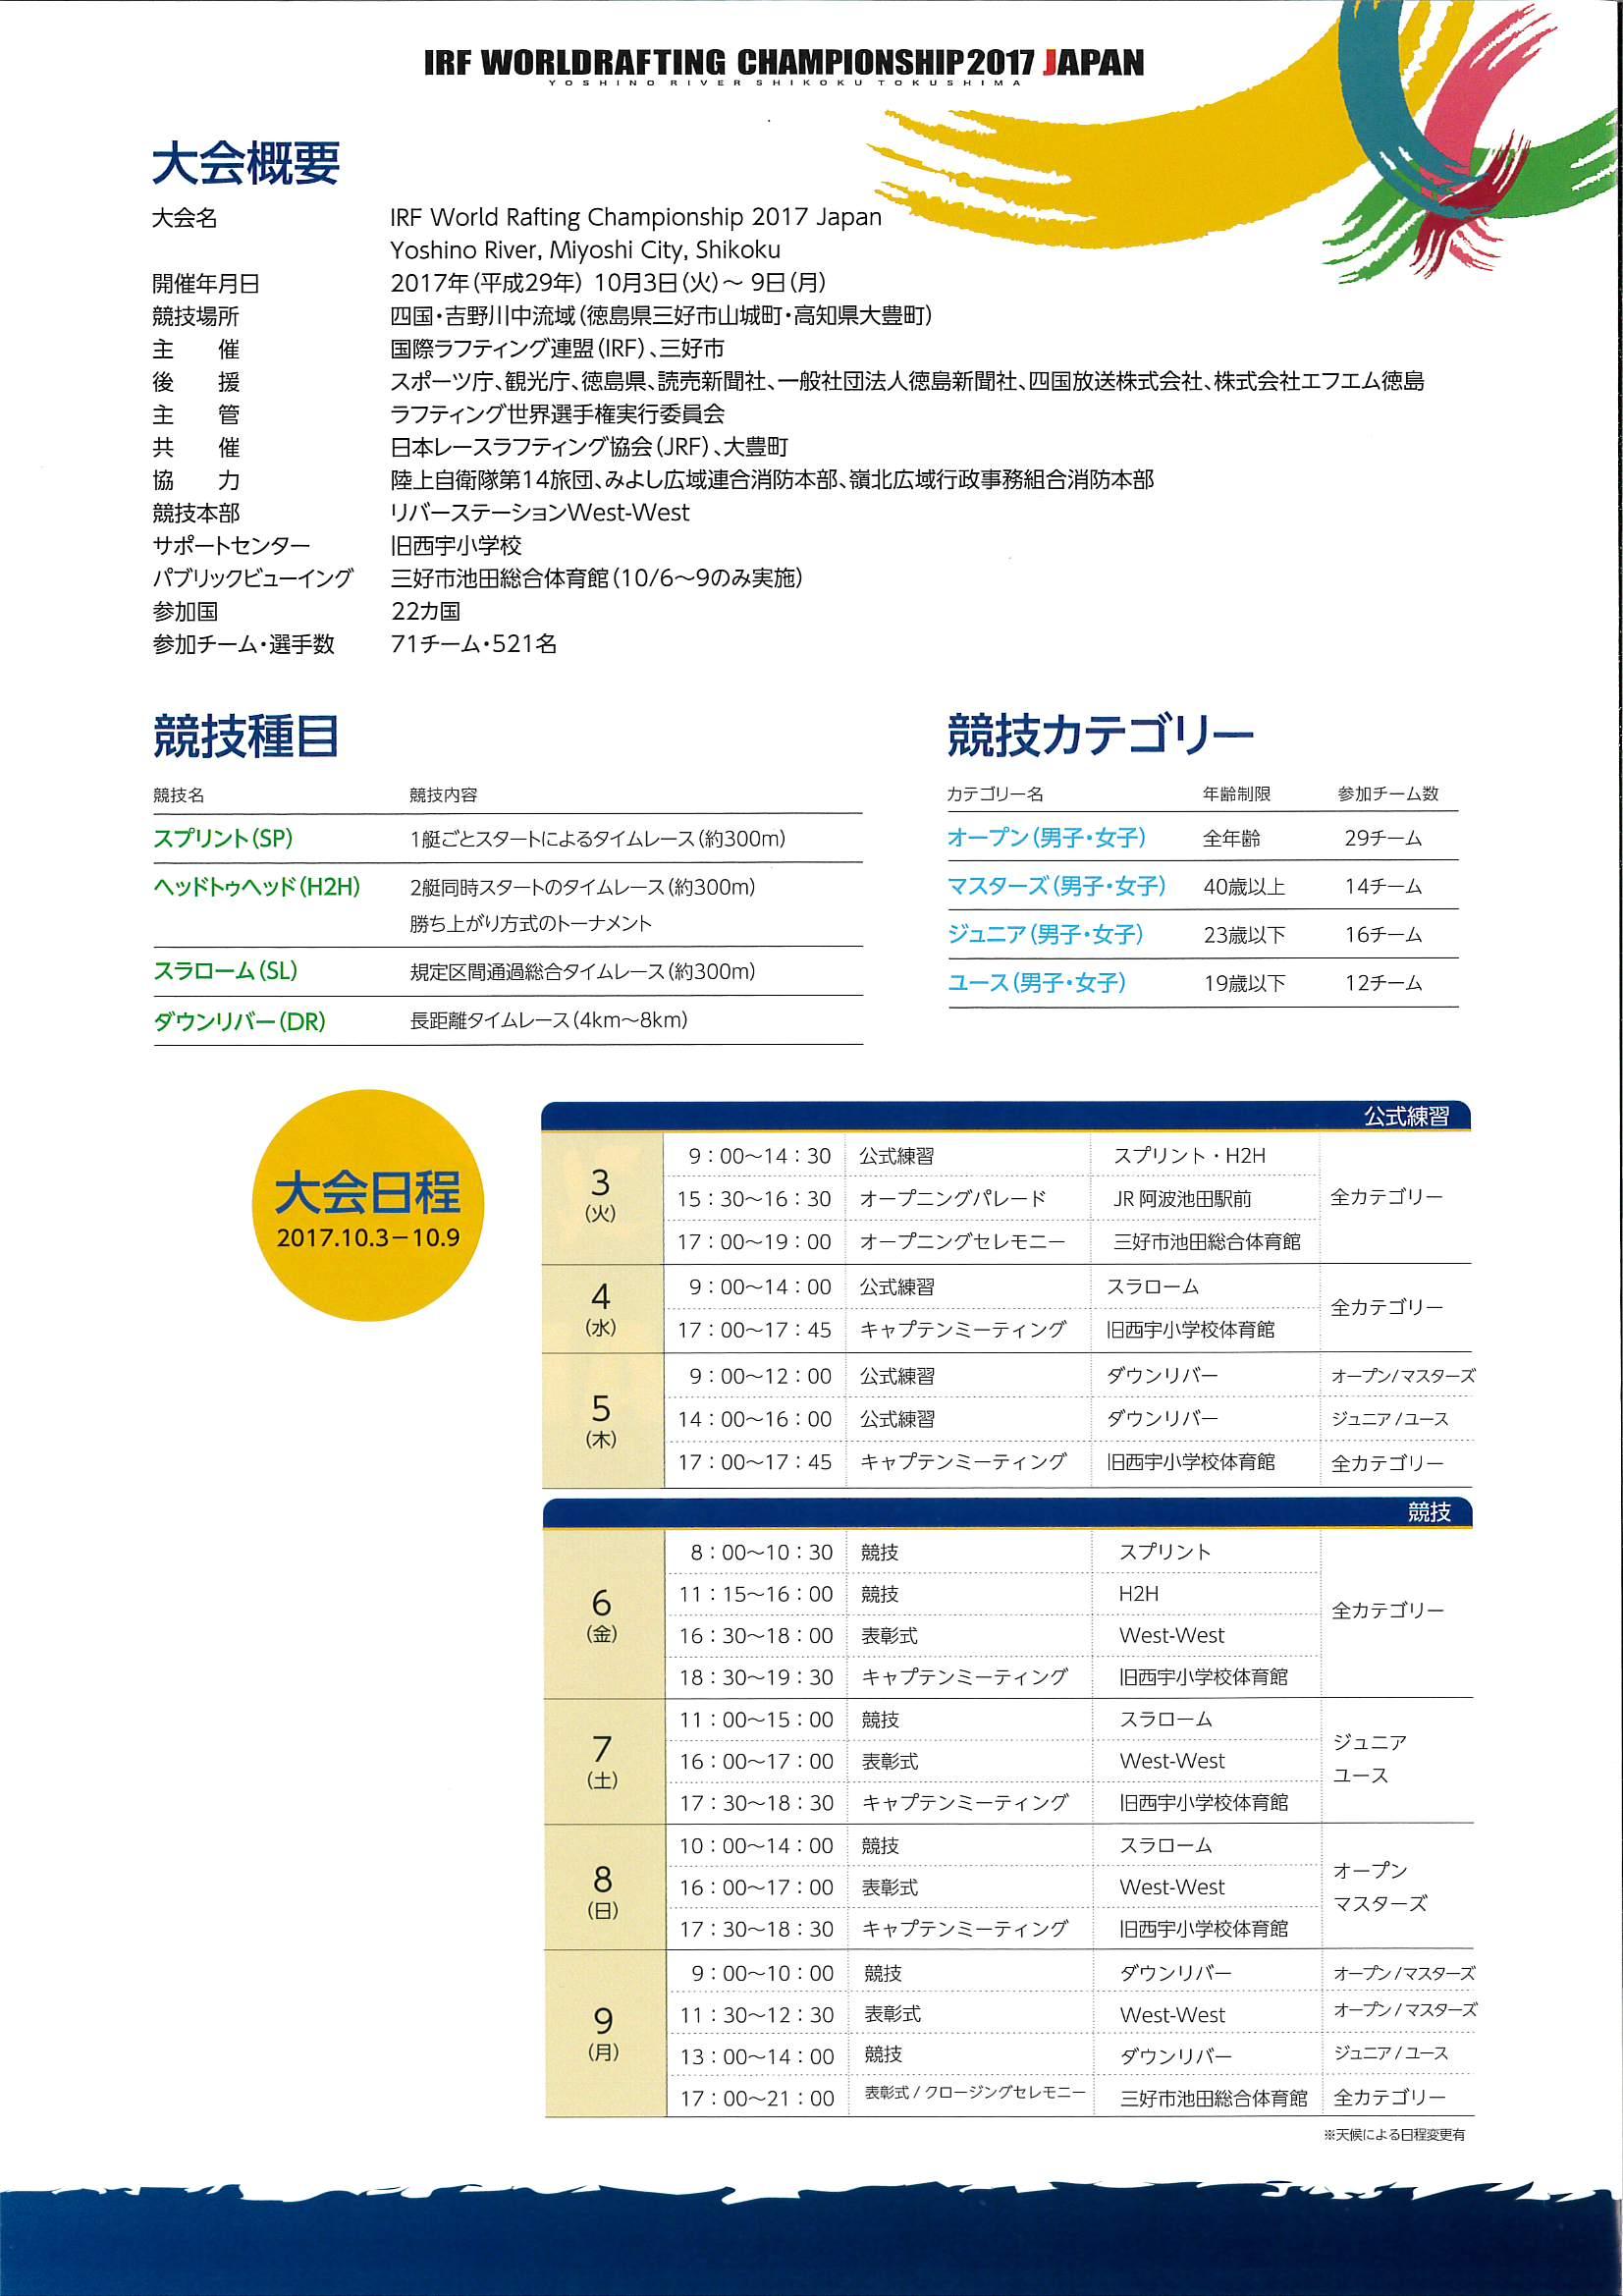 http://oboke-iya.jp/kawaraban/MX-3150FN_20171005_153604_0001.jpg